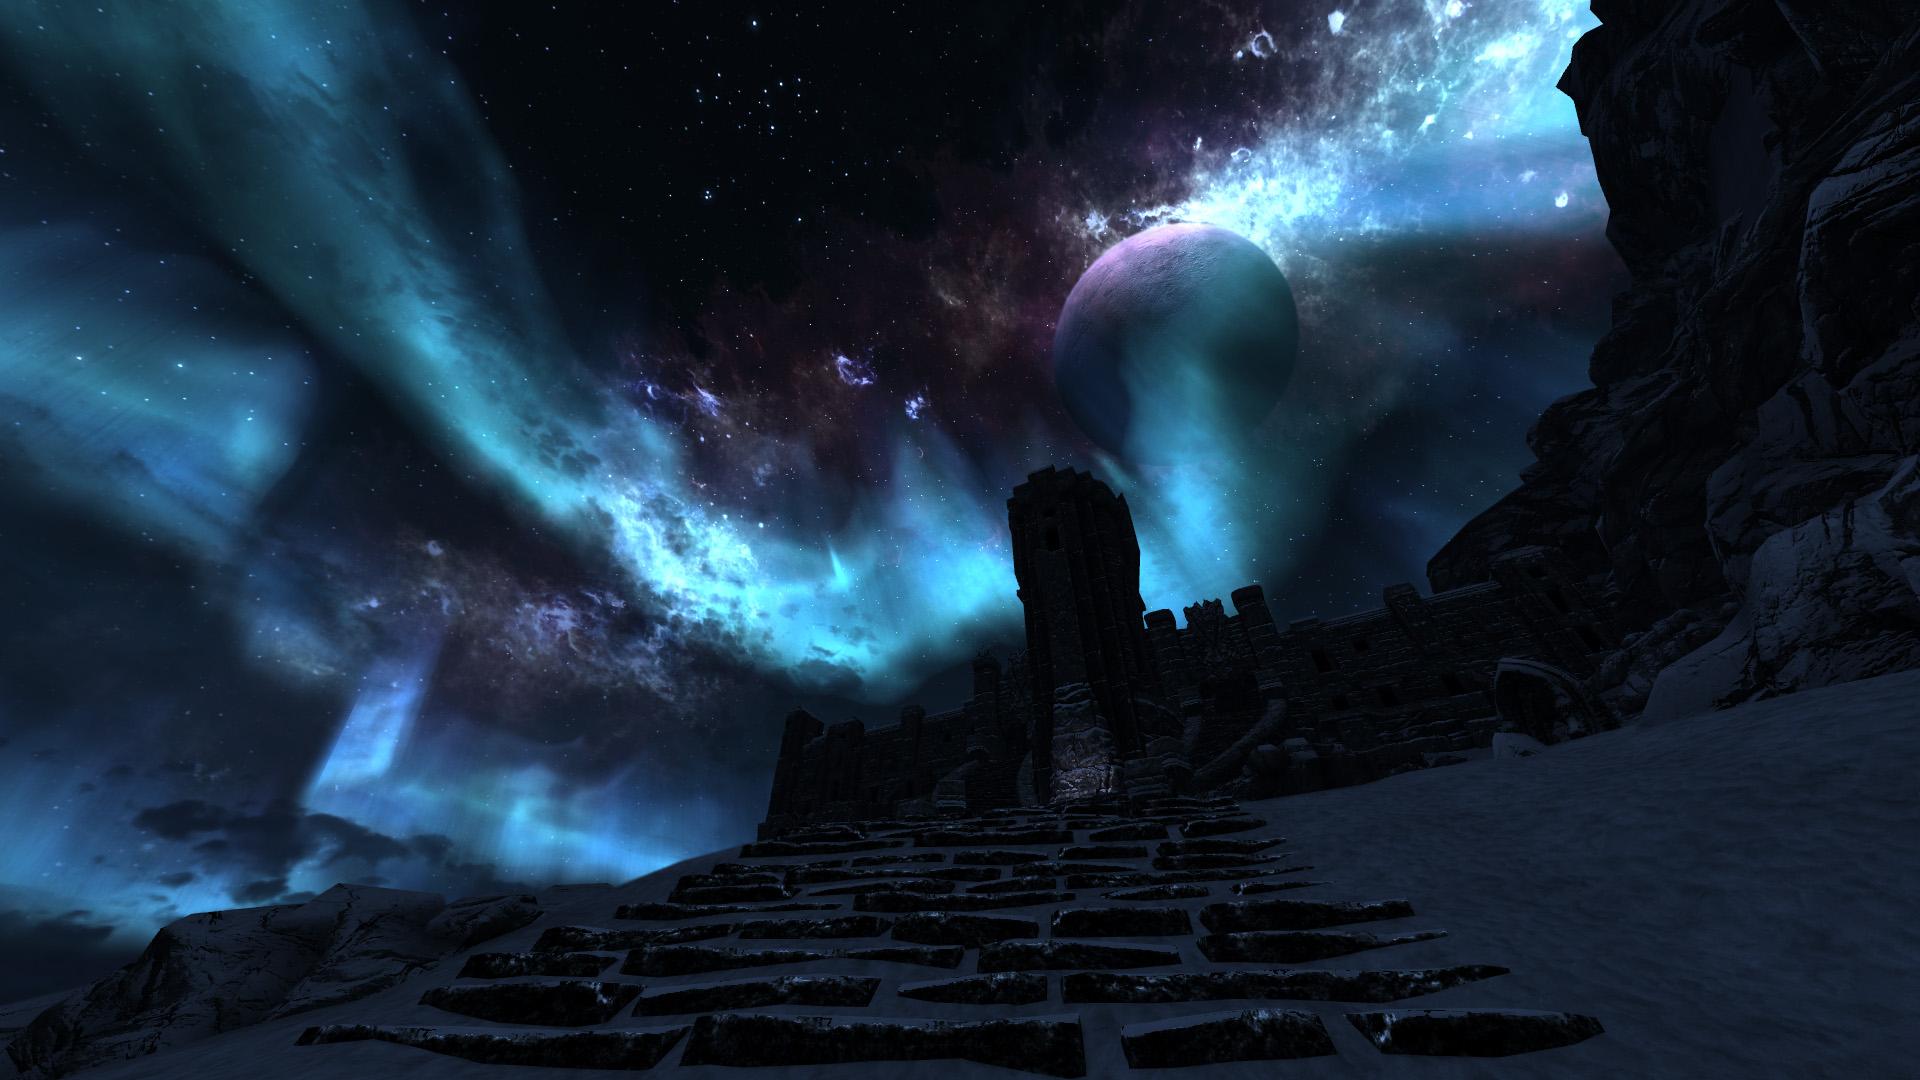 Gry Wideo The Elder Scrolls V Skyrim Tapeta